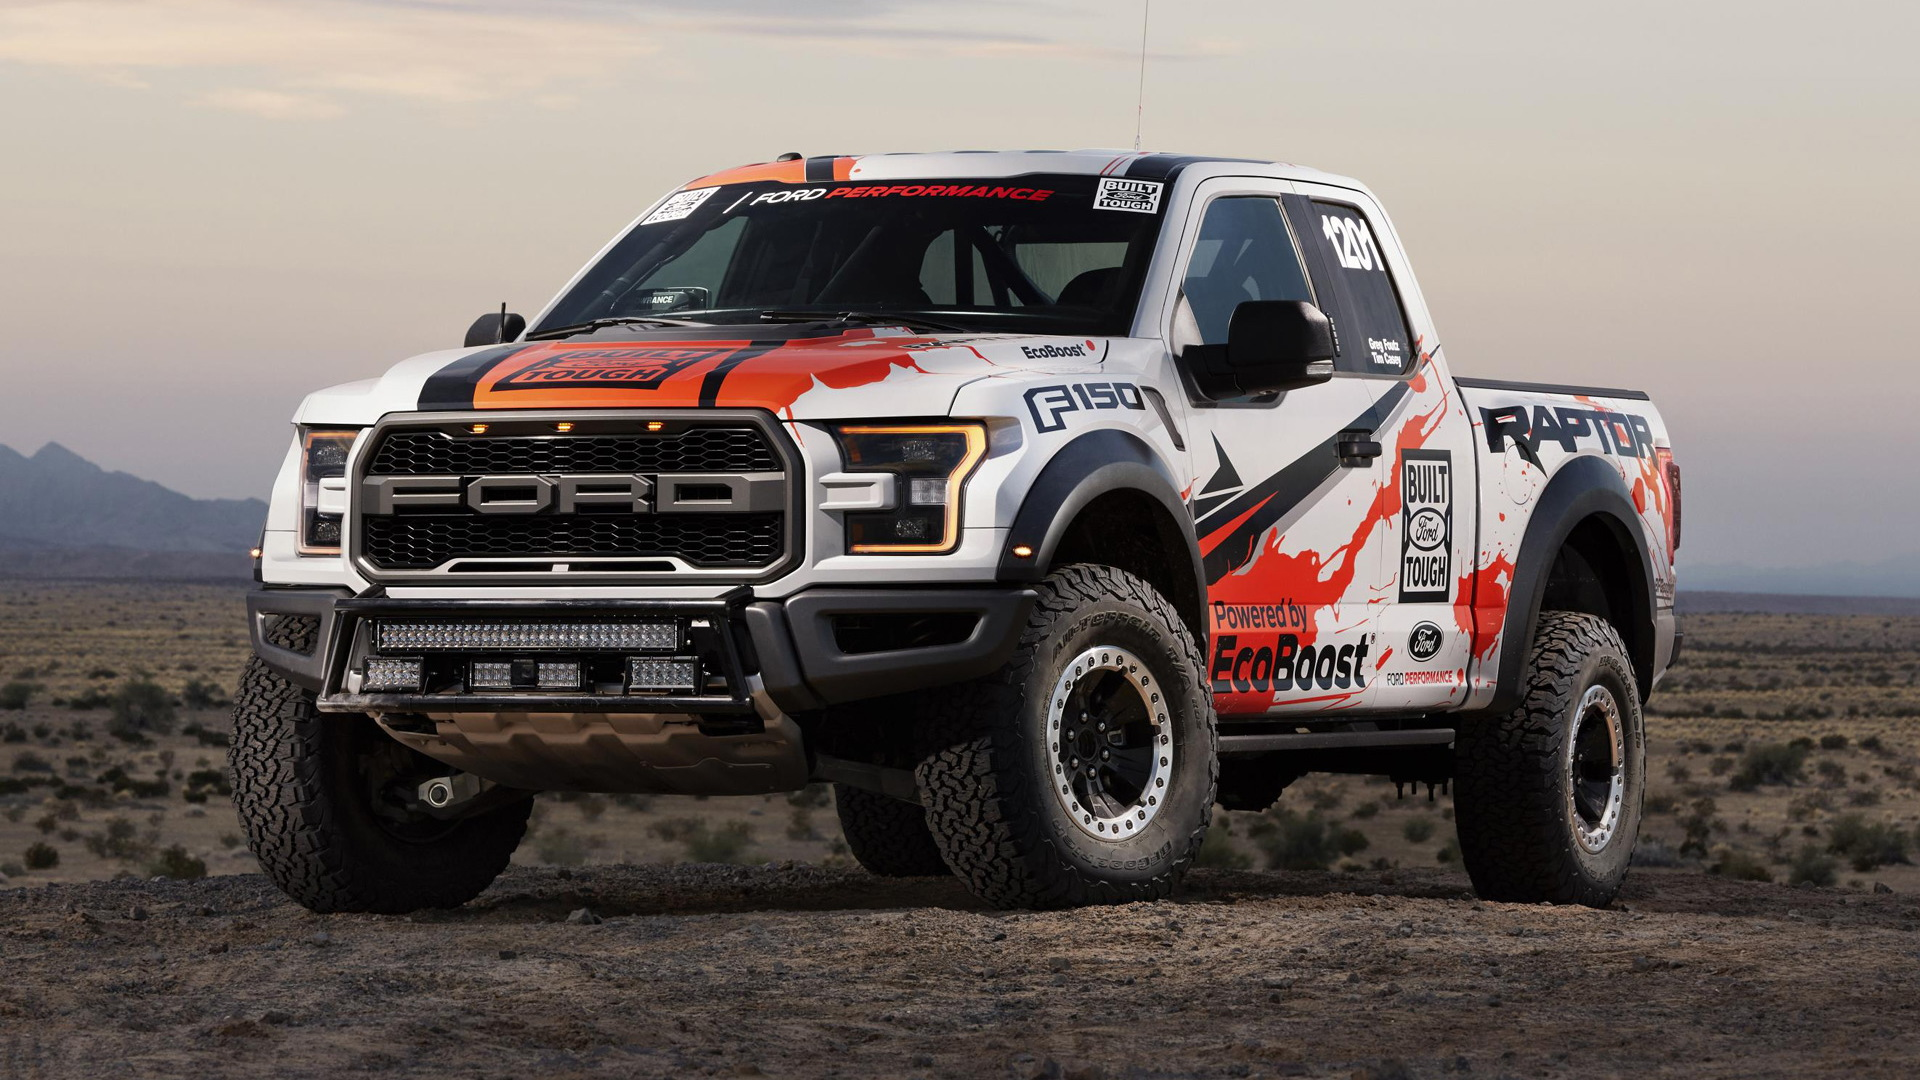 2016 Ford F-150 Raptor Baja 1000 racing truck